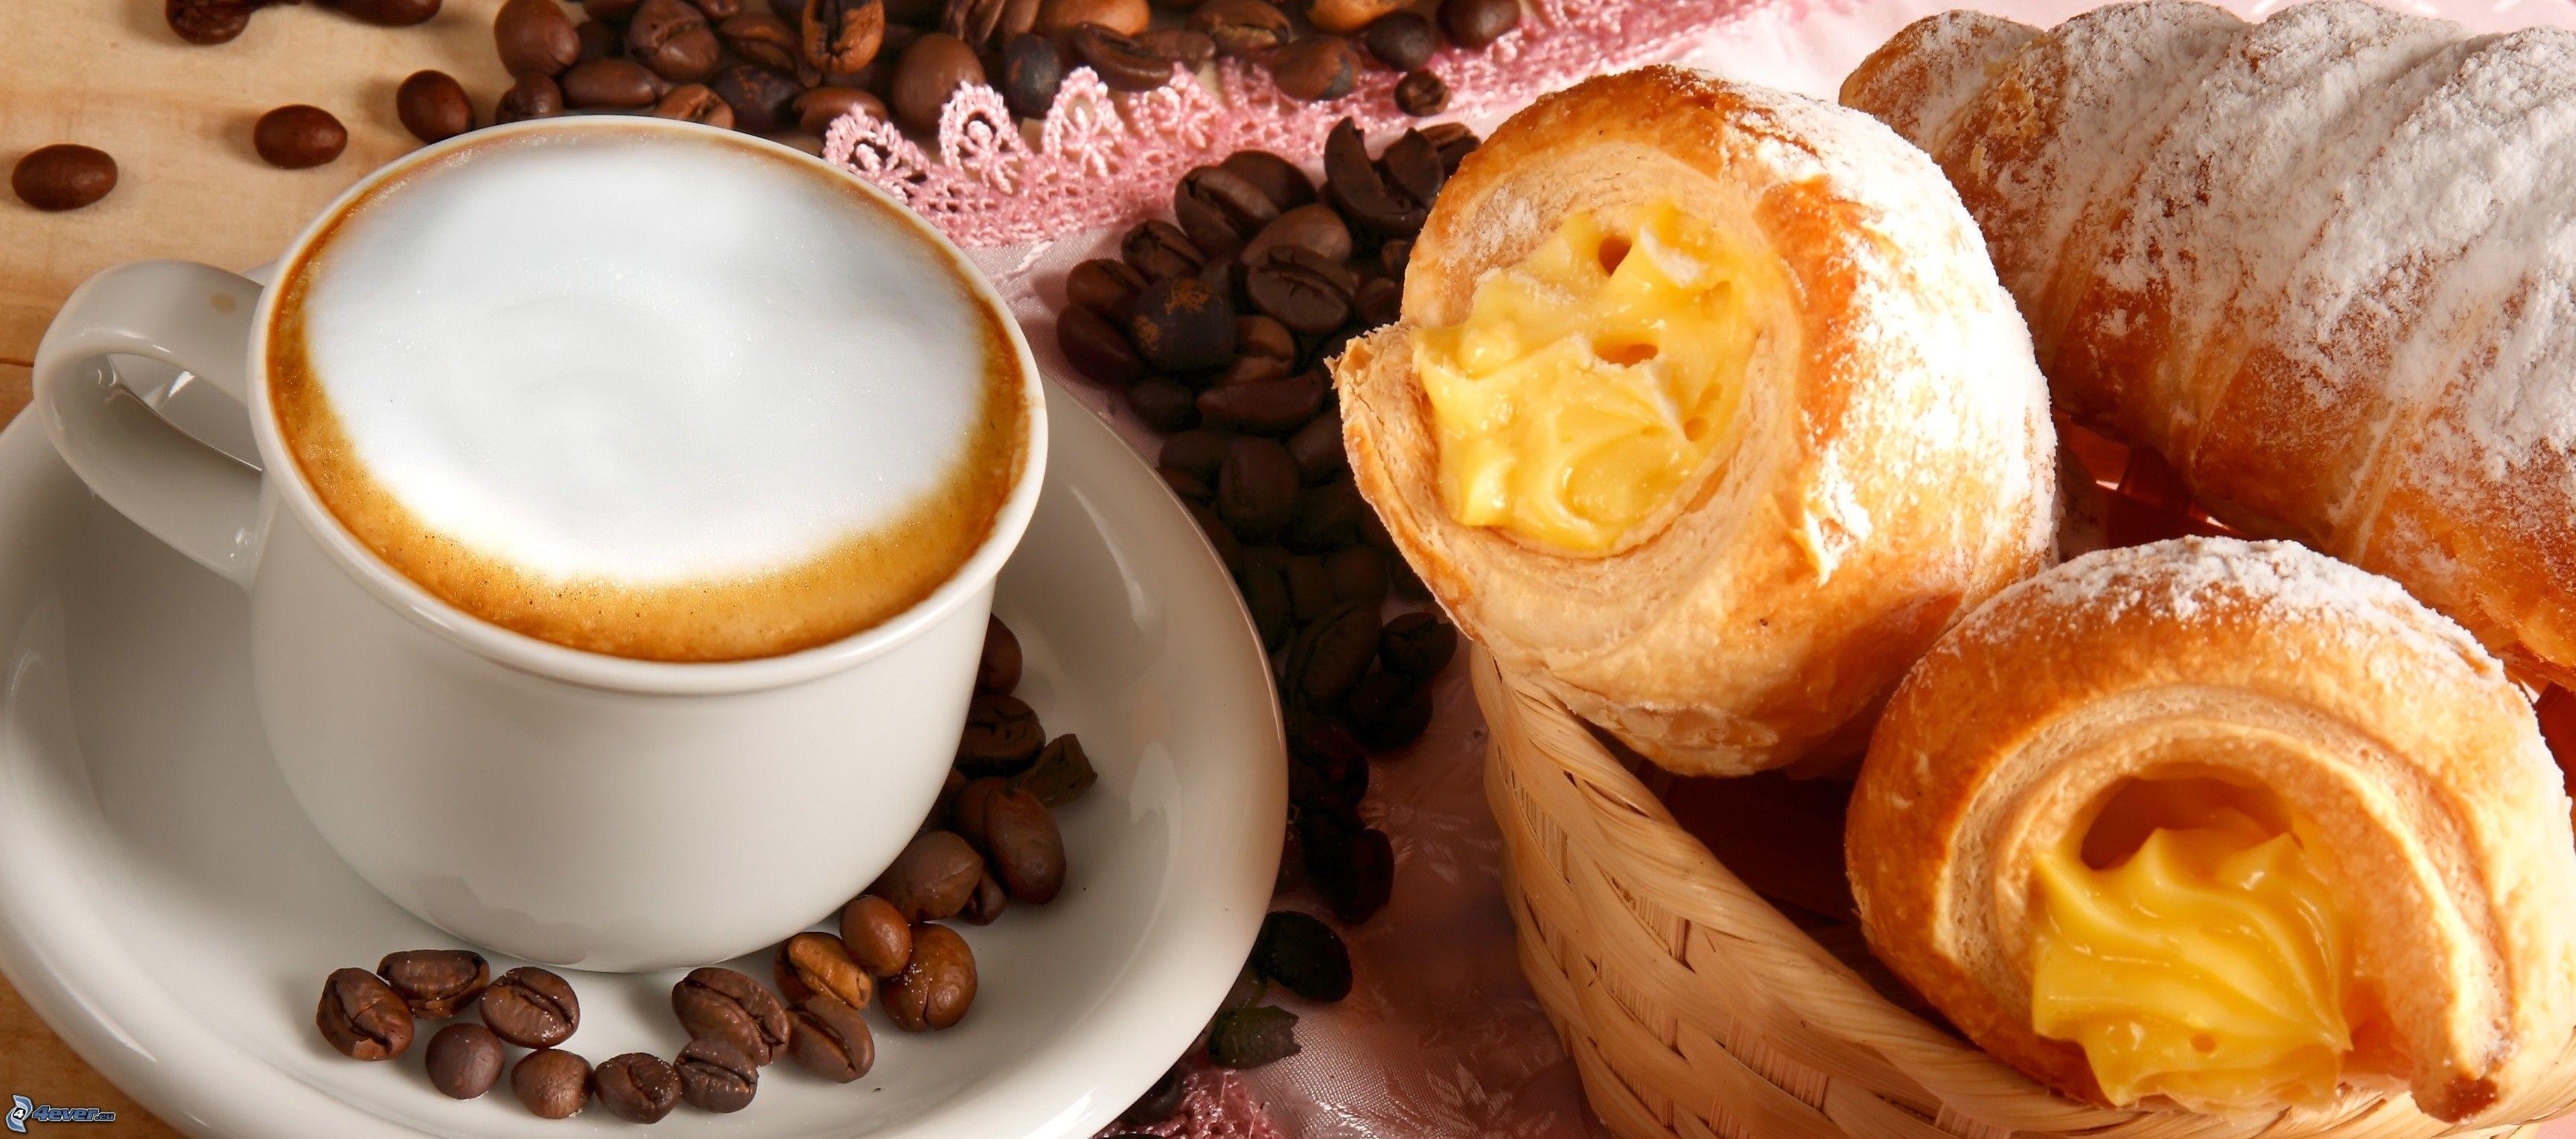 http://4everstatic.com/obrazki/jedzenie-i-picie/sniadanie,-filizanka-kawy,-rogale-200622.jpg